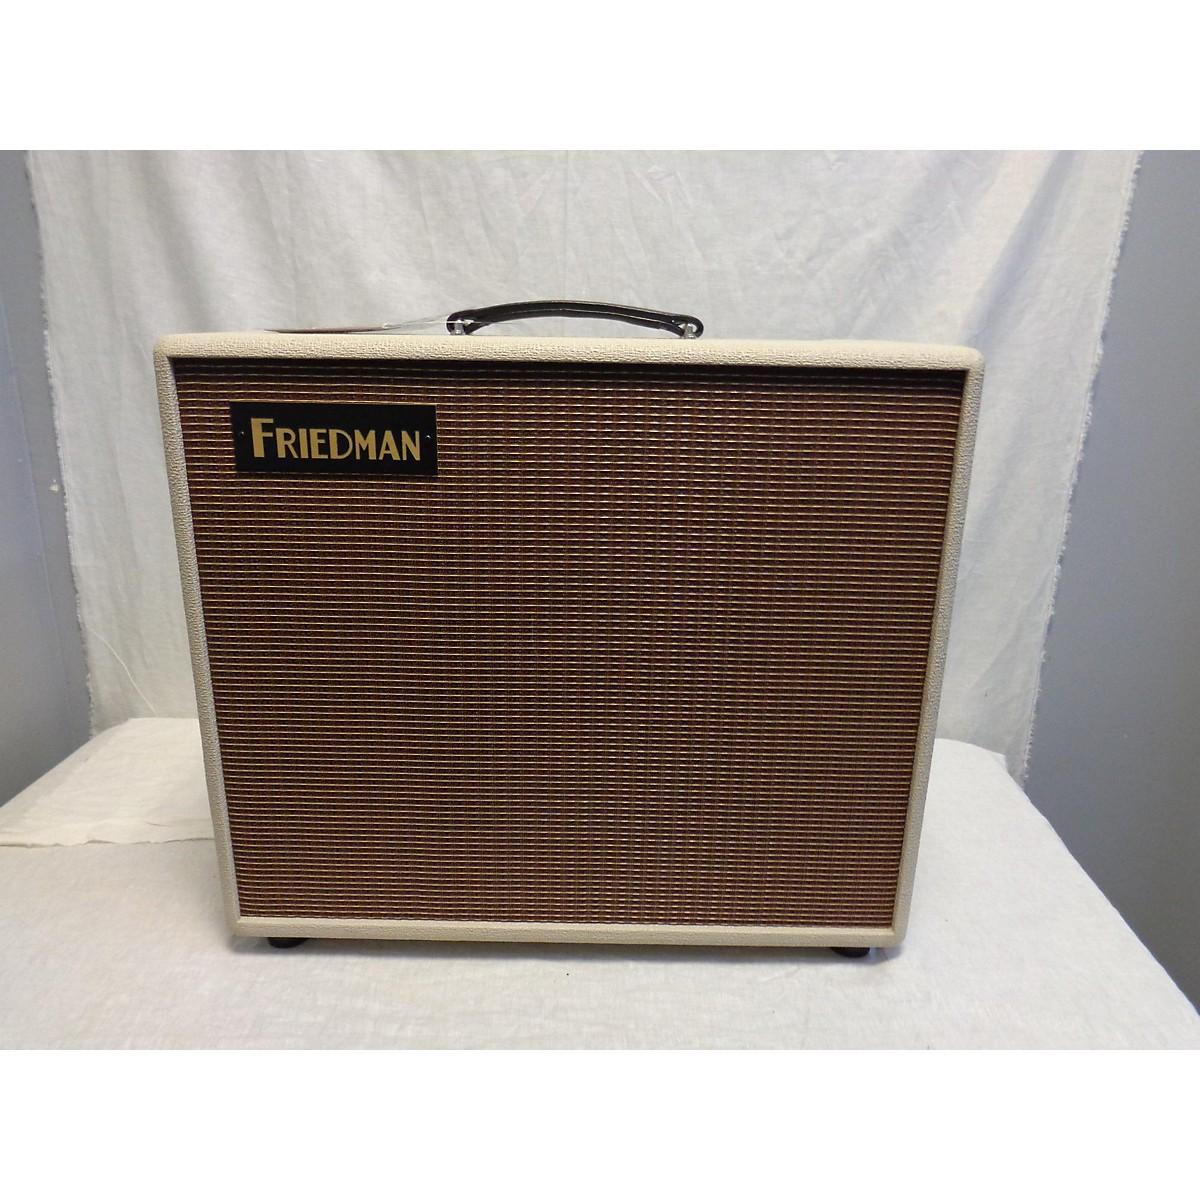 Friedman Buxom Betty 50W 1x12 Tube Guitar Combo Amp